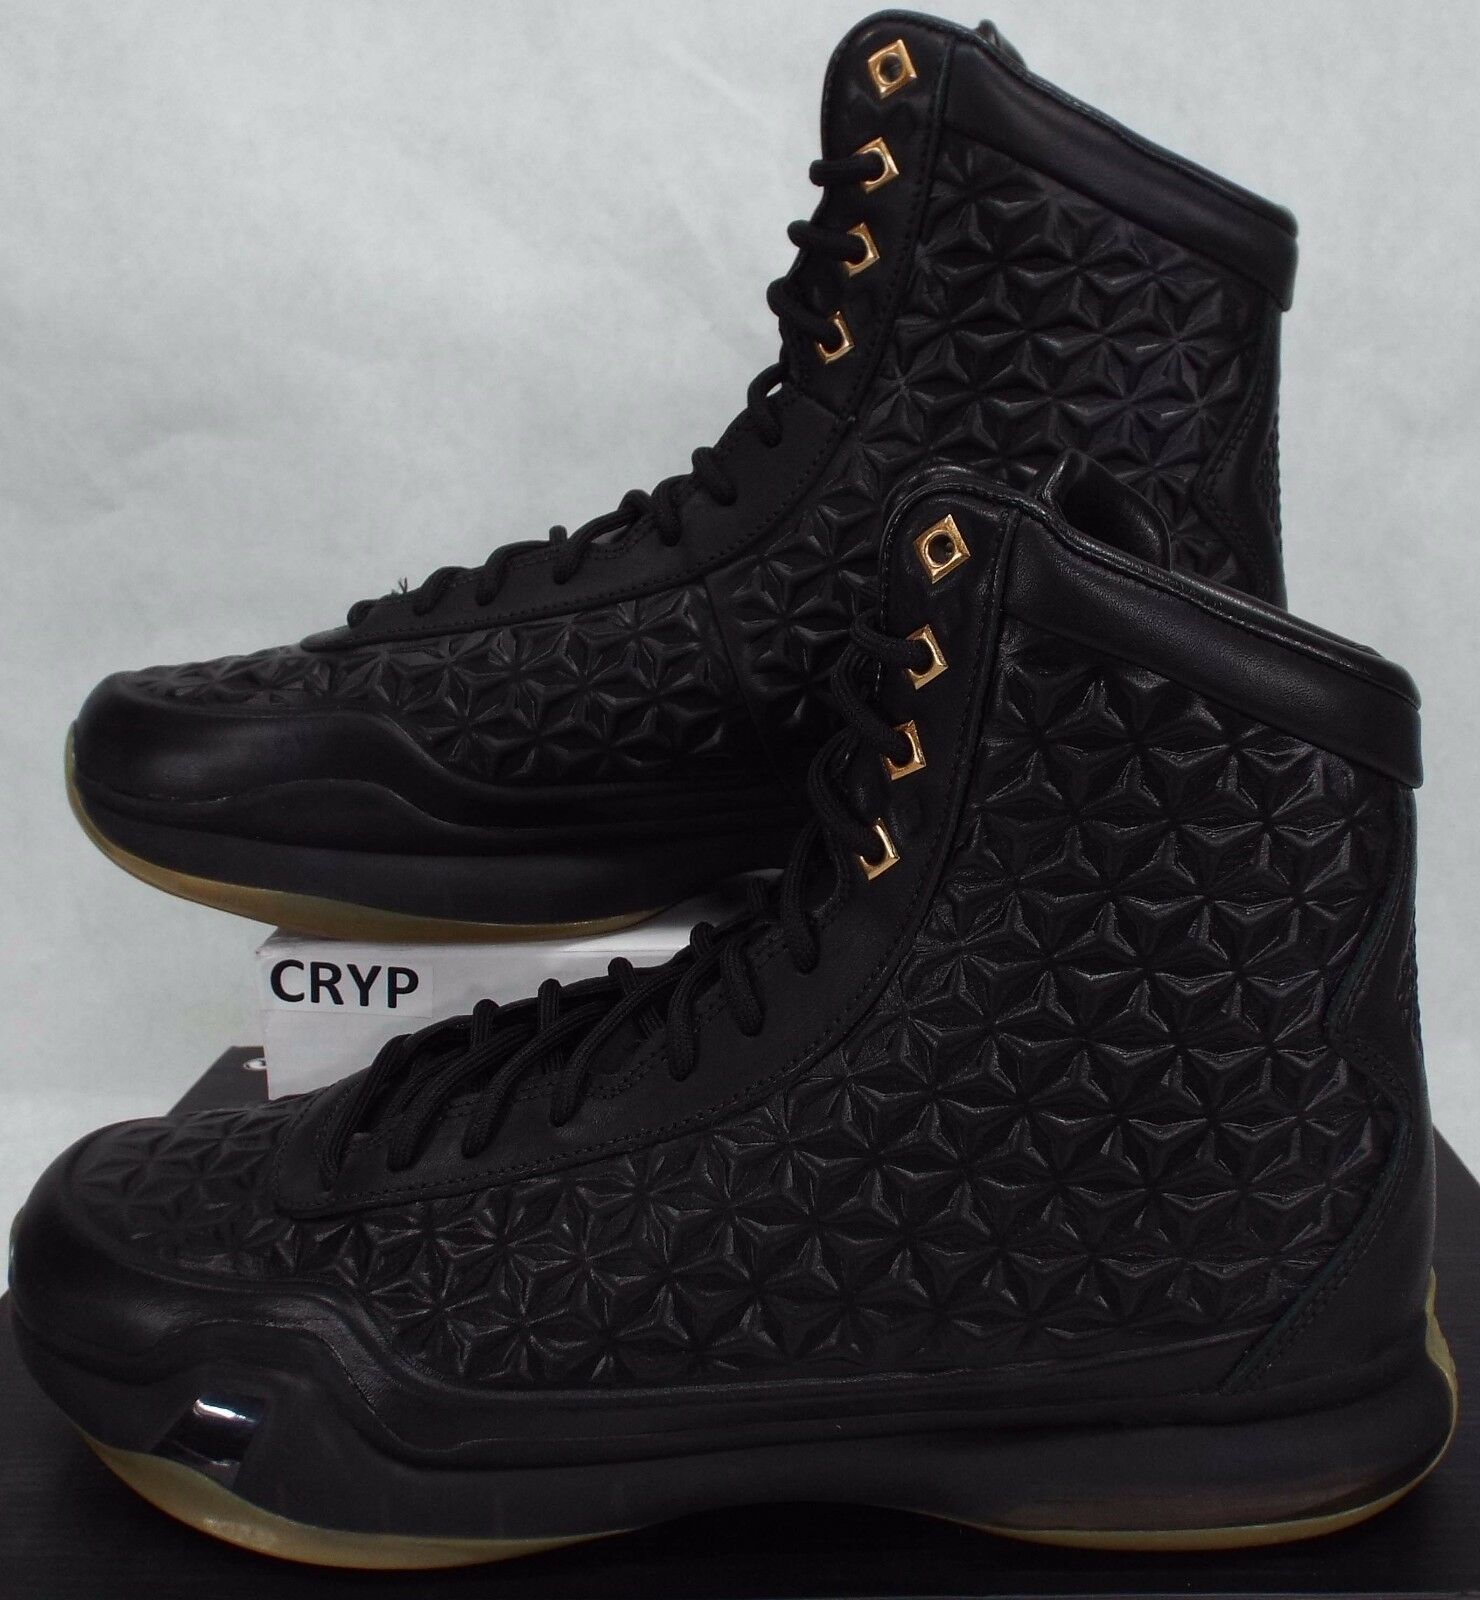 Nuevo hombre 9.5 NIKE Kobe Elite EXT QS QS EXT Cuero X Zapatos de baloncesto 275 822950 -001 e6177d